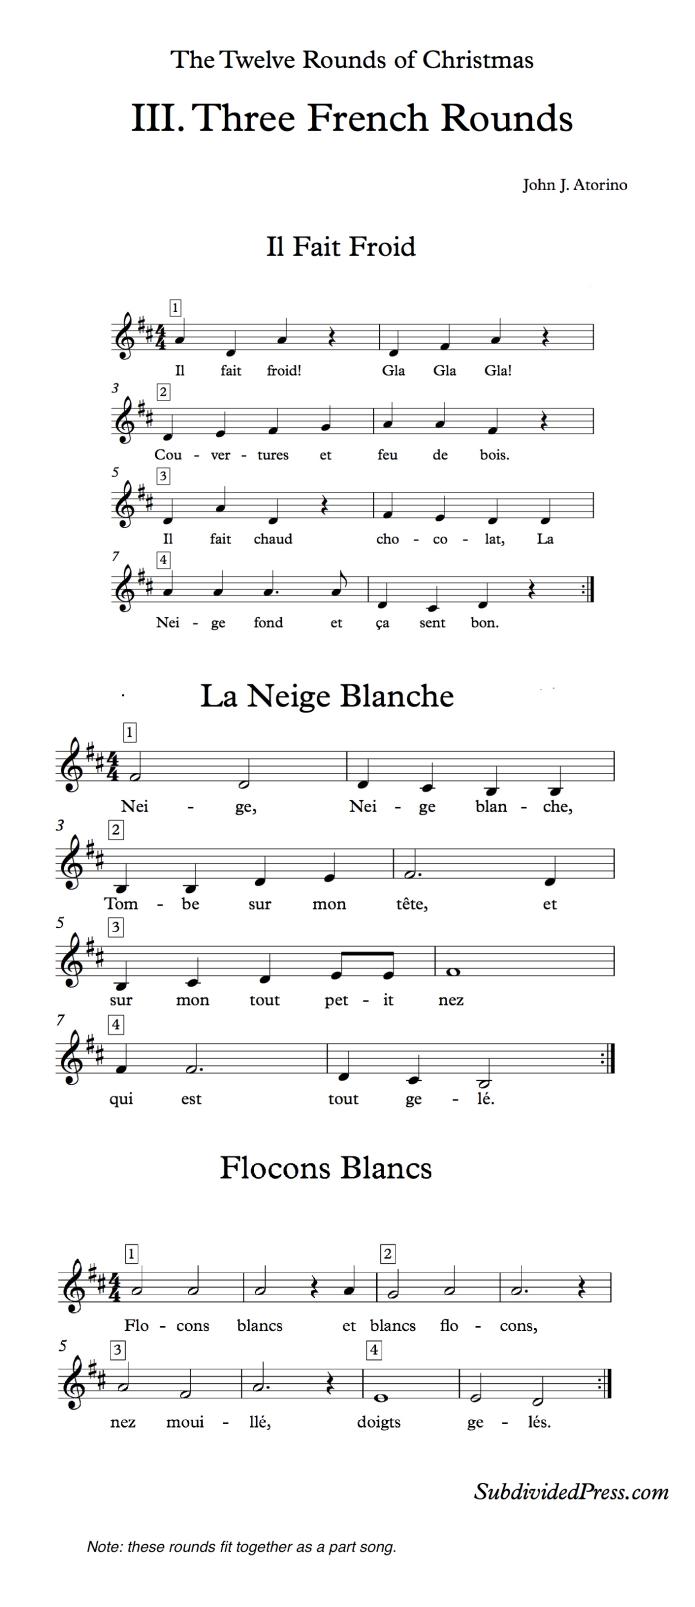 choral music french singing round